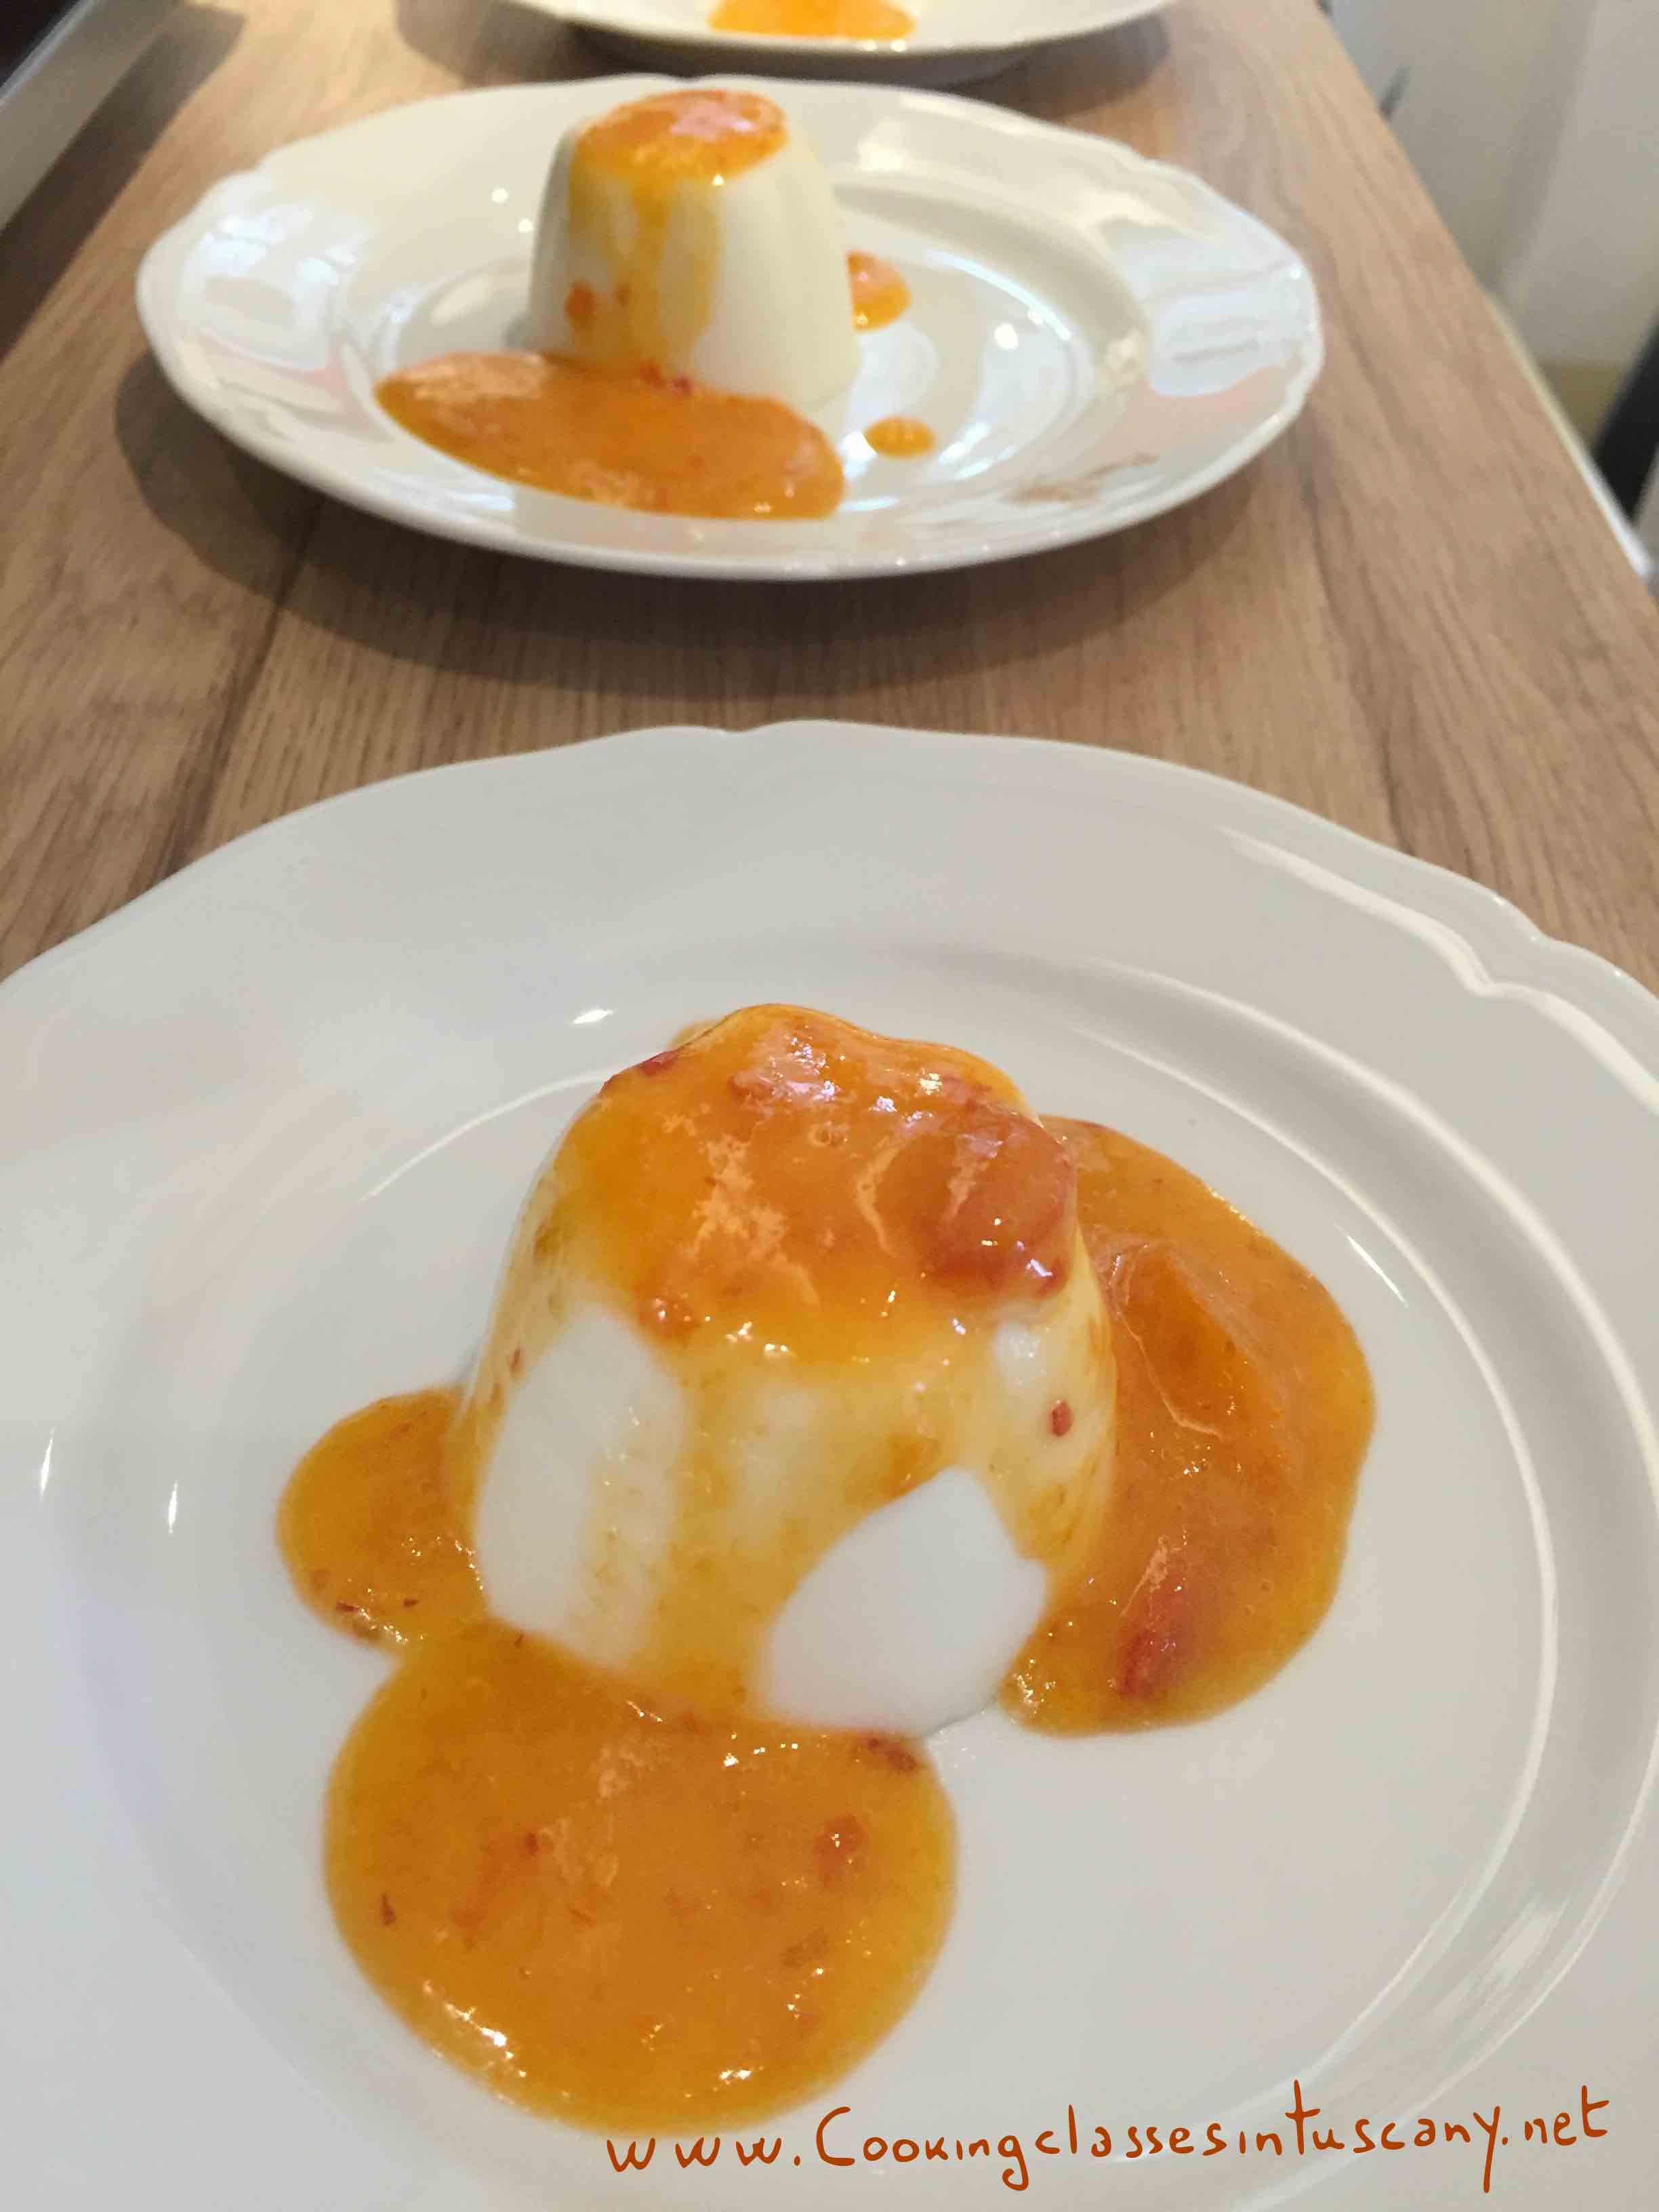 panna cotta and apricots sauce